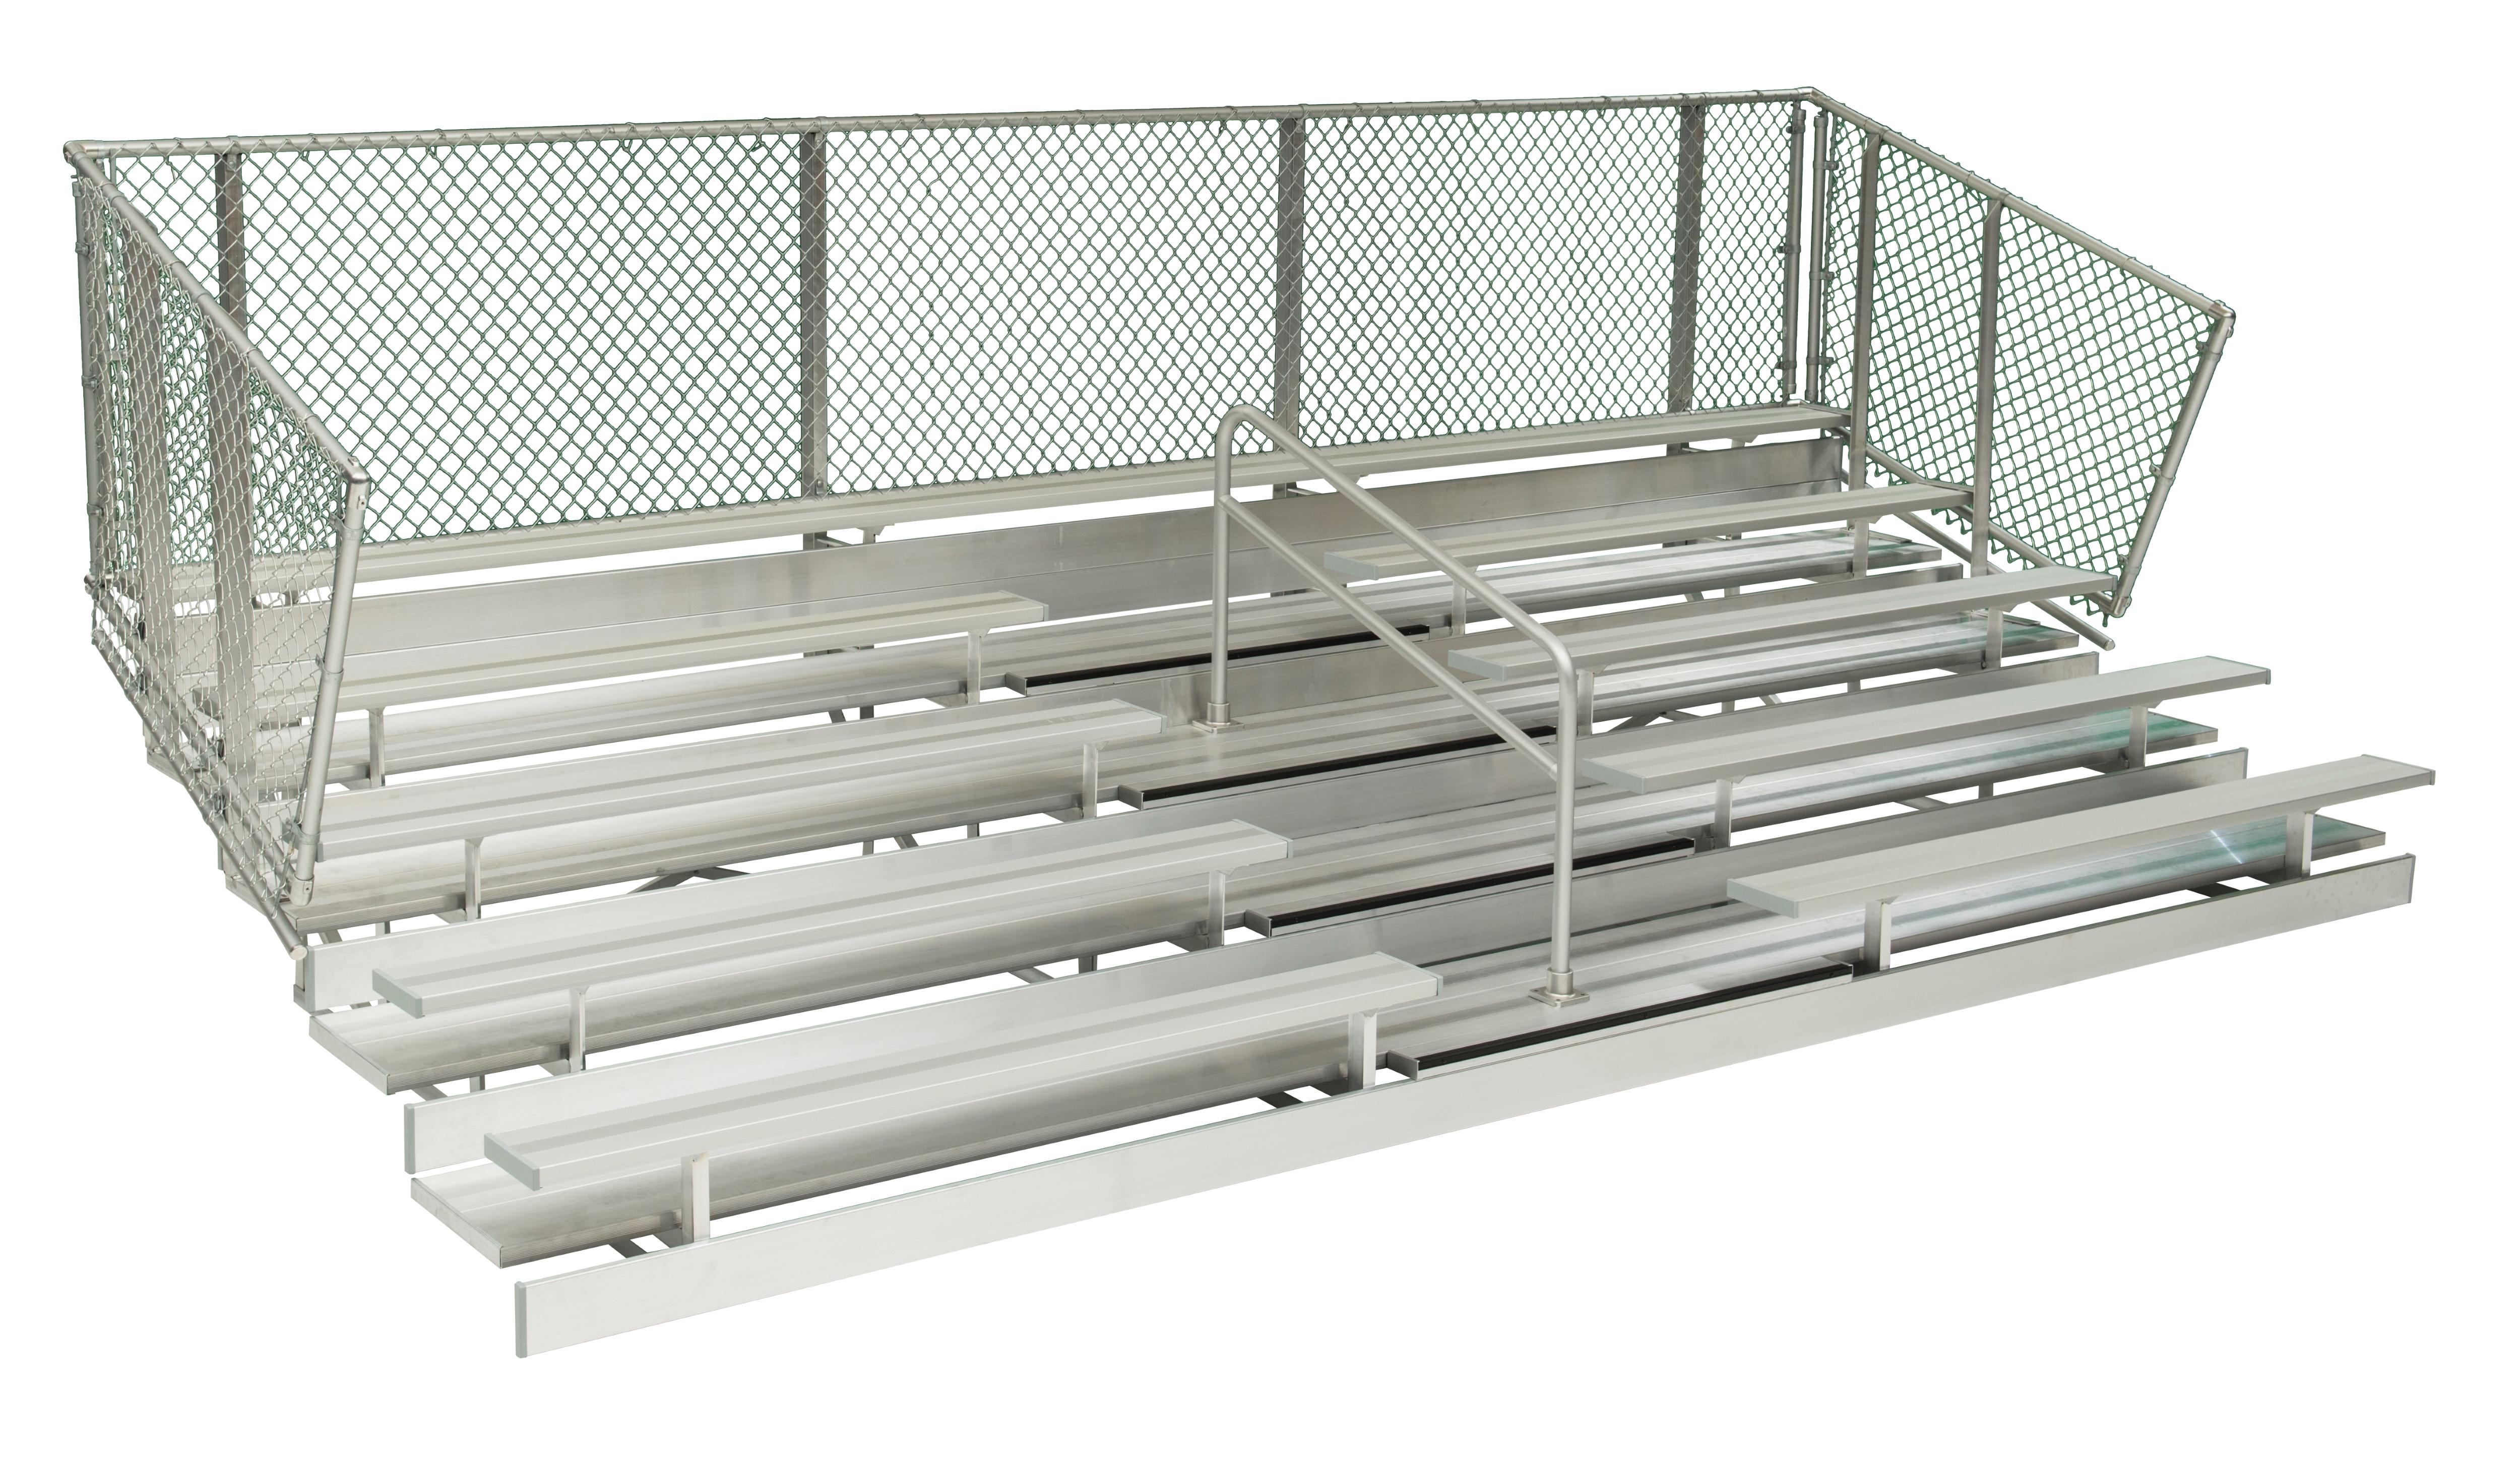 5 Row Aluminum Bleachers - Midfielder Series